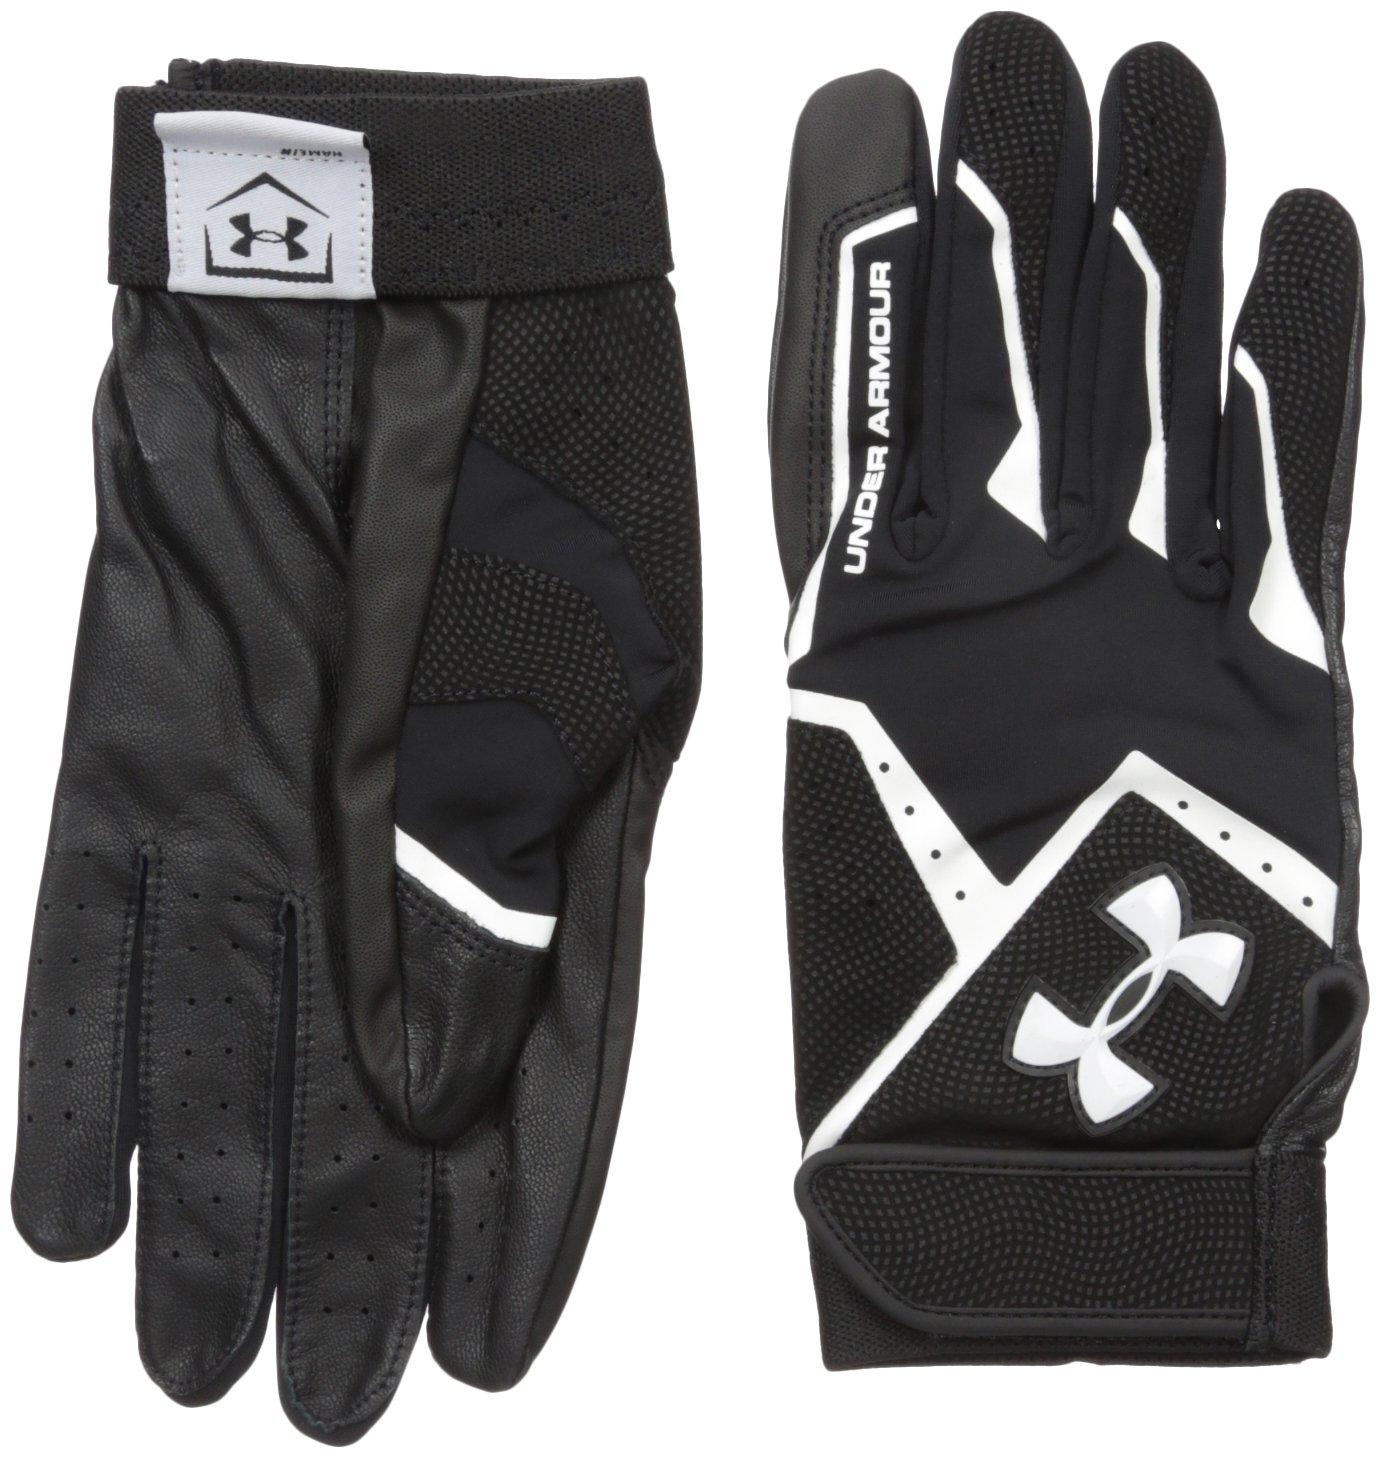 Black leather batting gloves - Amazon Com Under Armour Men S Clean Up Vi Batting Gloves Sports Outdoors